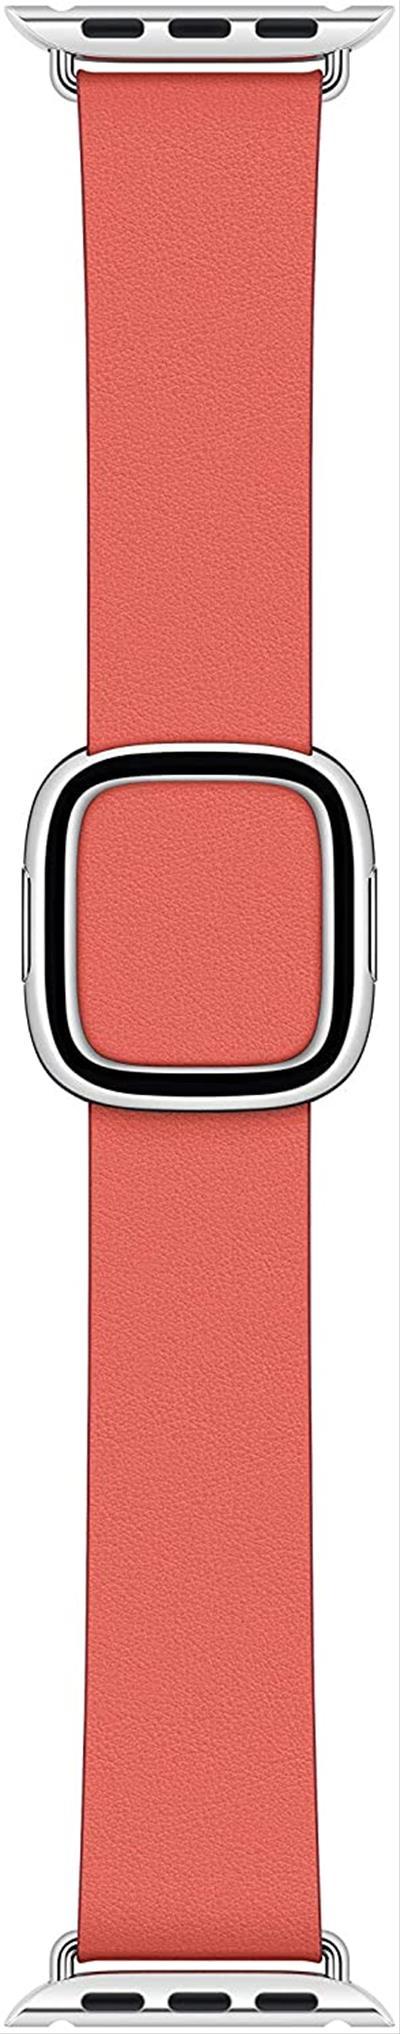 Correa Apple Watch 40mm L pomelo rosa